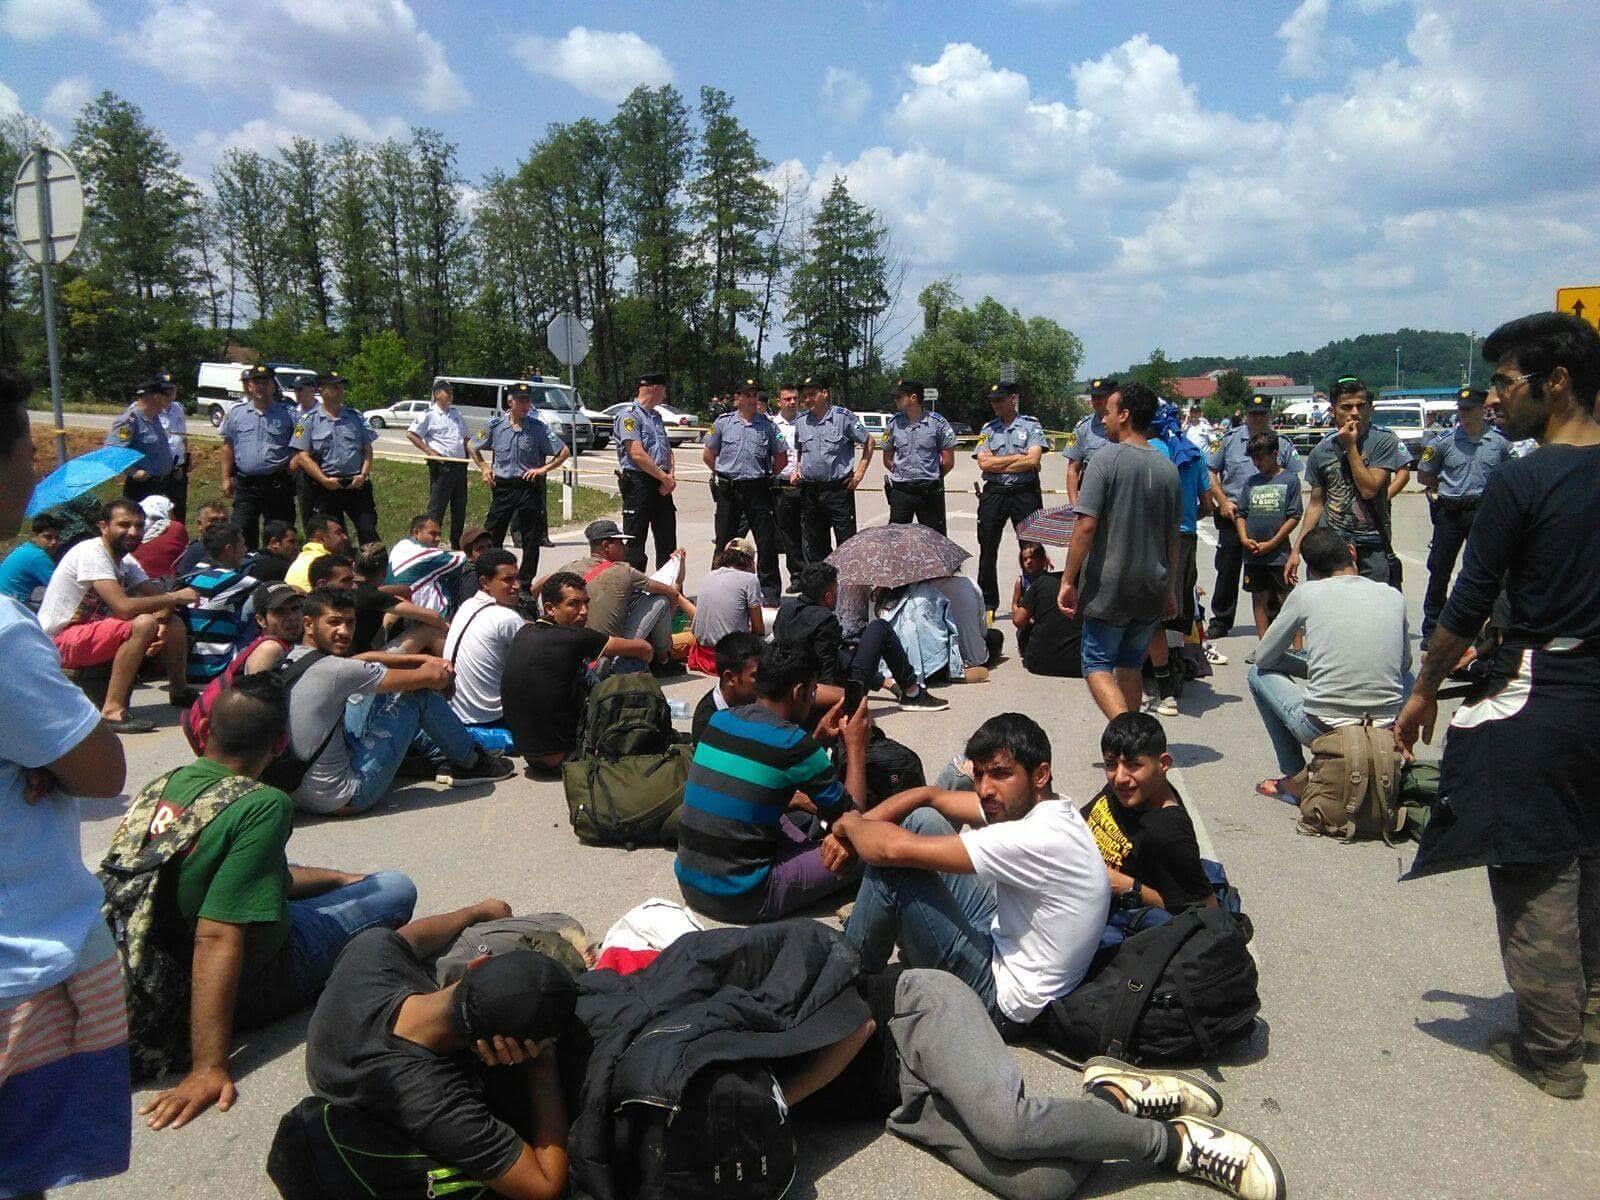 Bosnia and Herzegovina expels 18 migrants